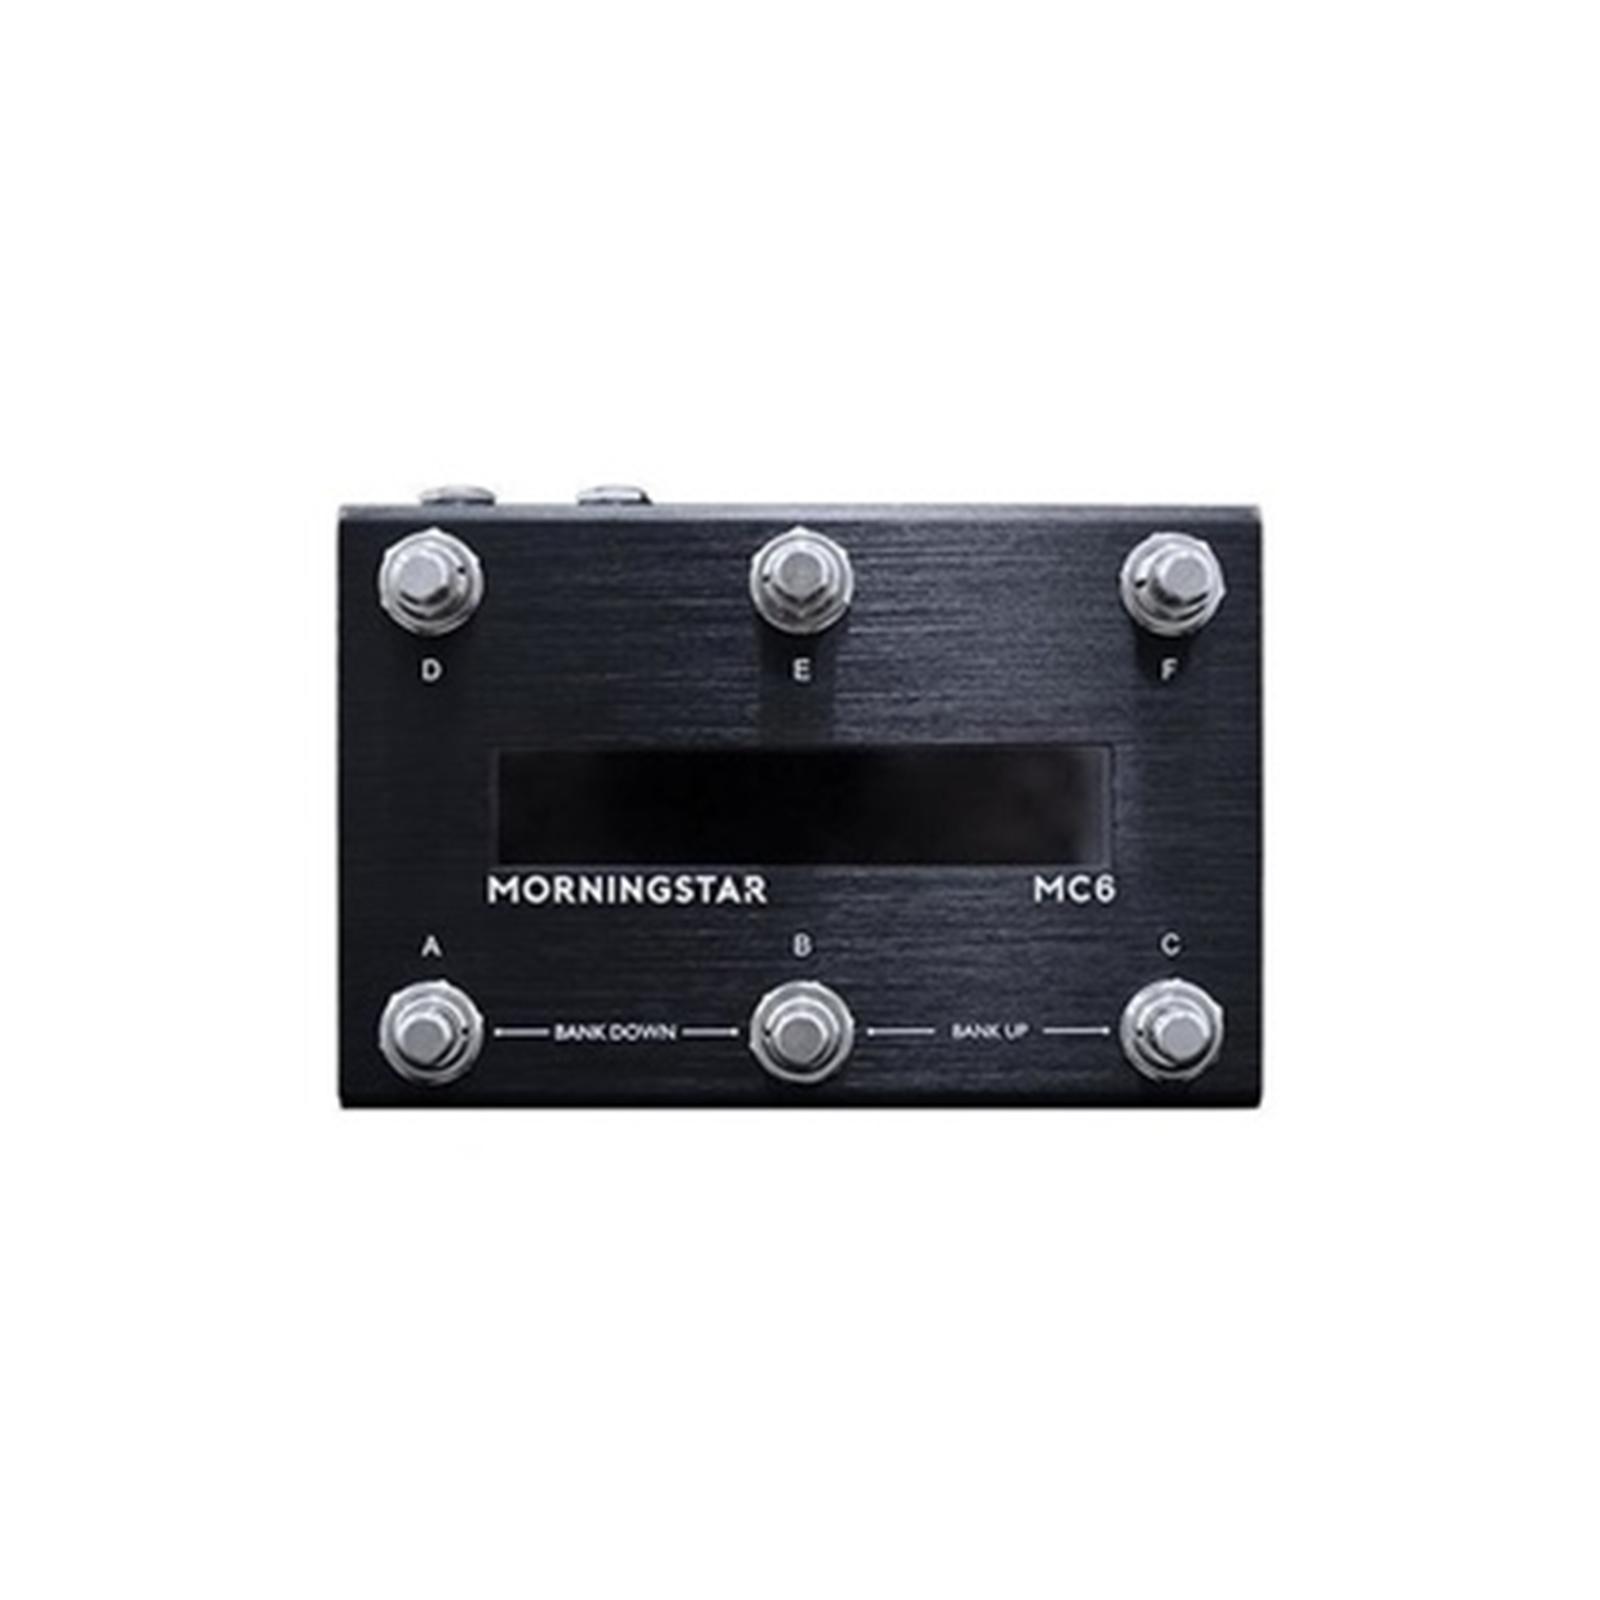 Morningstar - MC6 MkII MIDI Controller Pedal